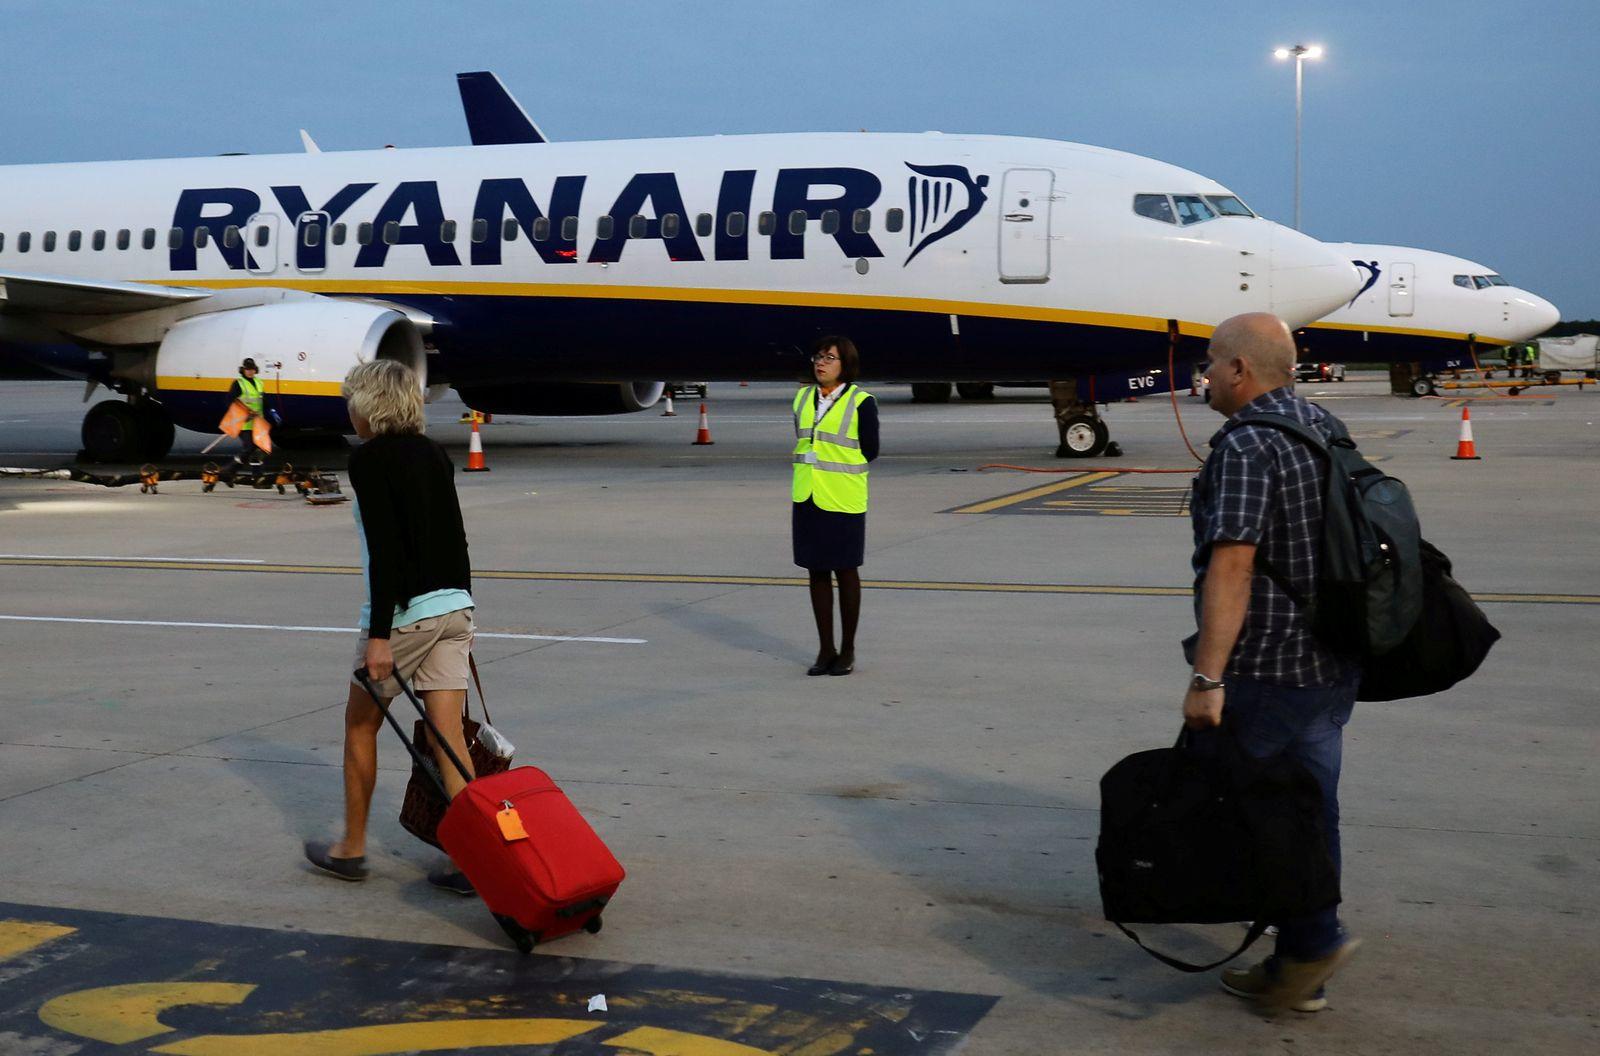 Ryanair / Handgepäck